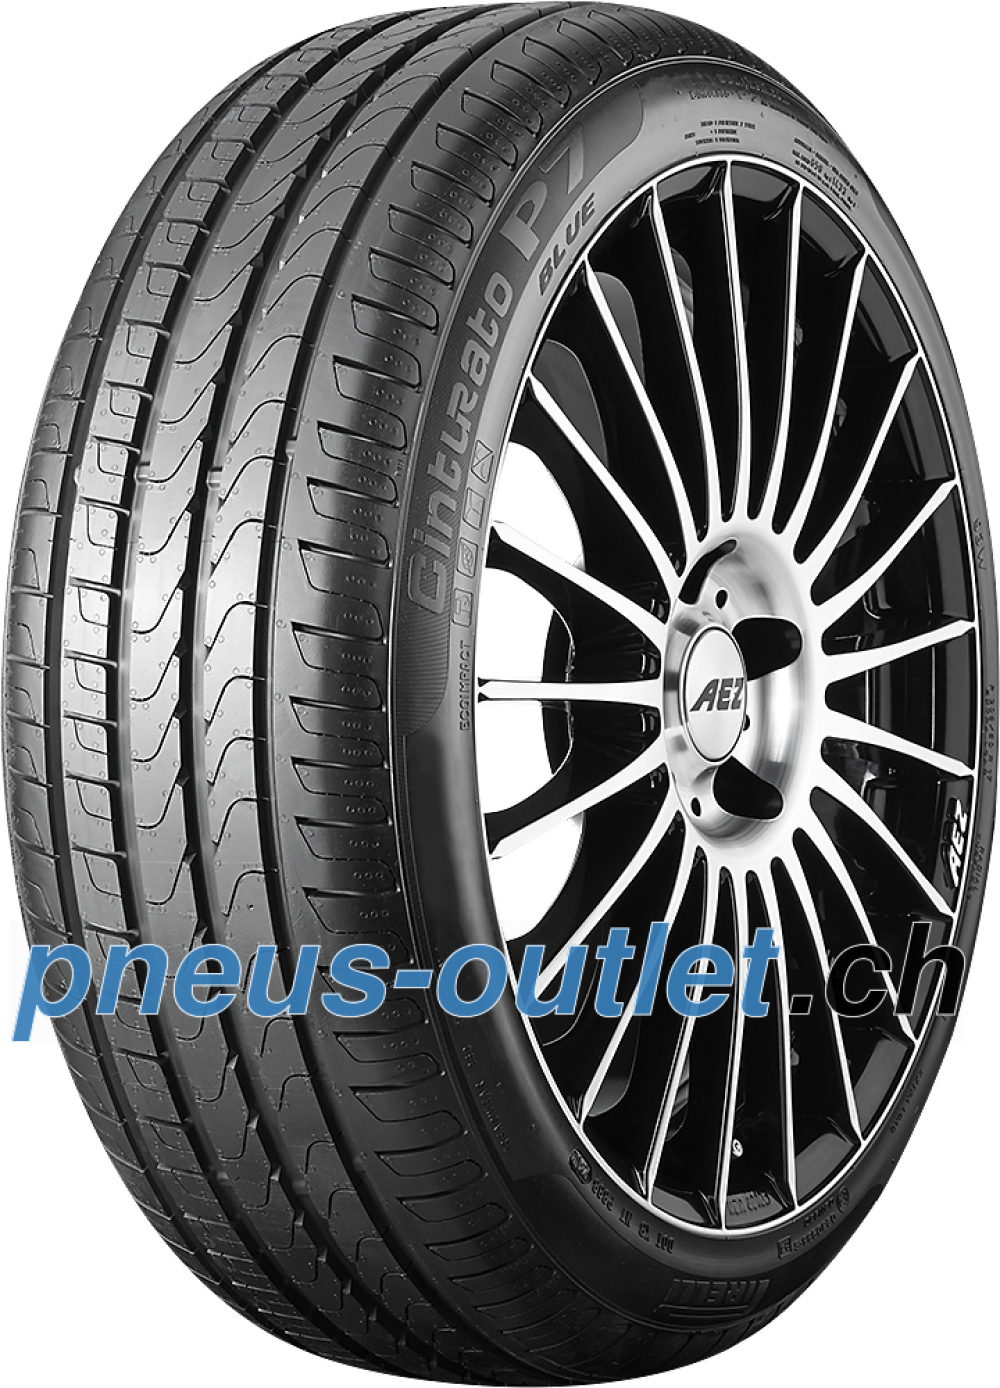 Pirelli Cinturato P7 Blue ( 225/45 R17 91V AO, avec protège-jante (MFS) )